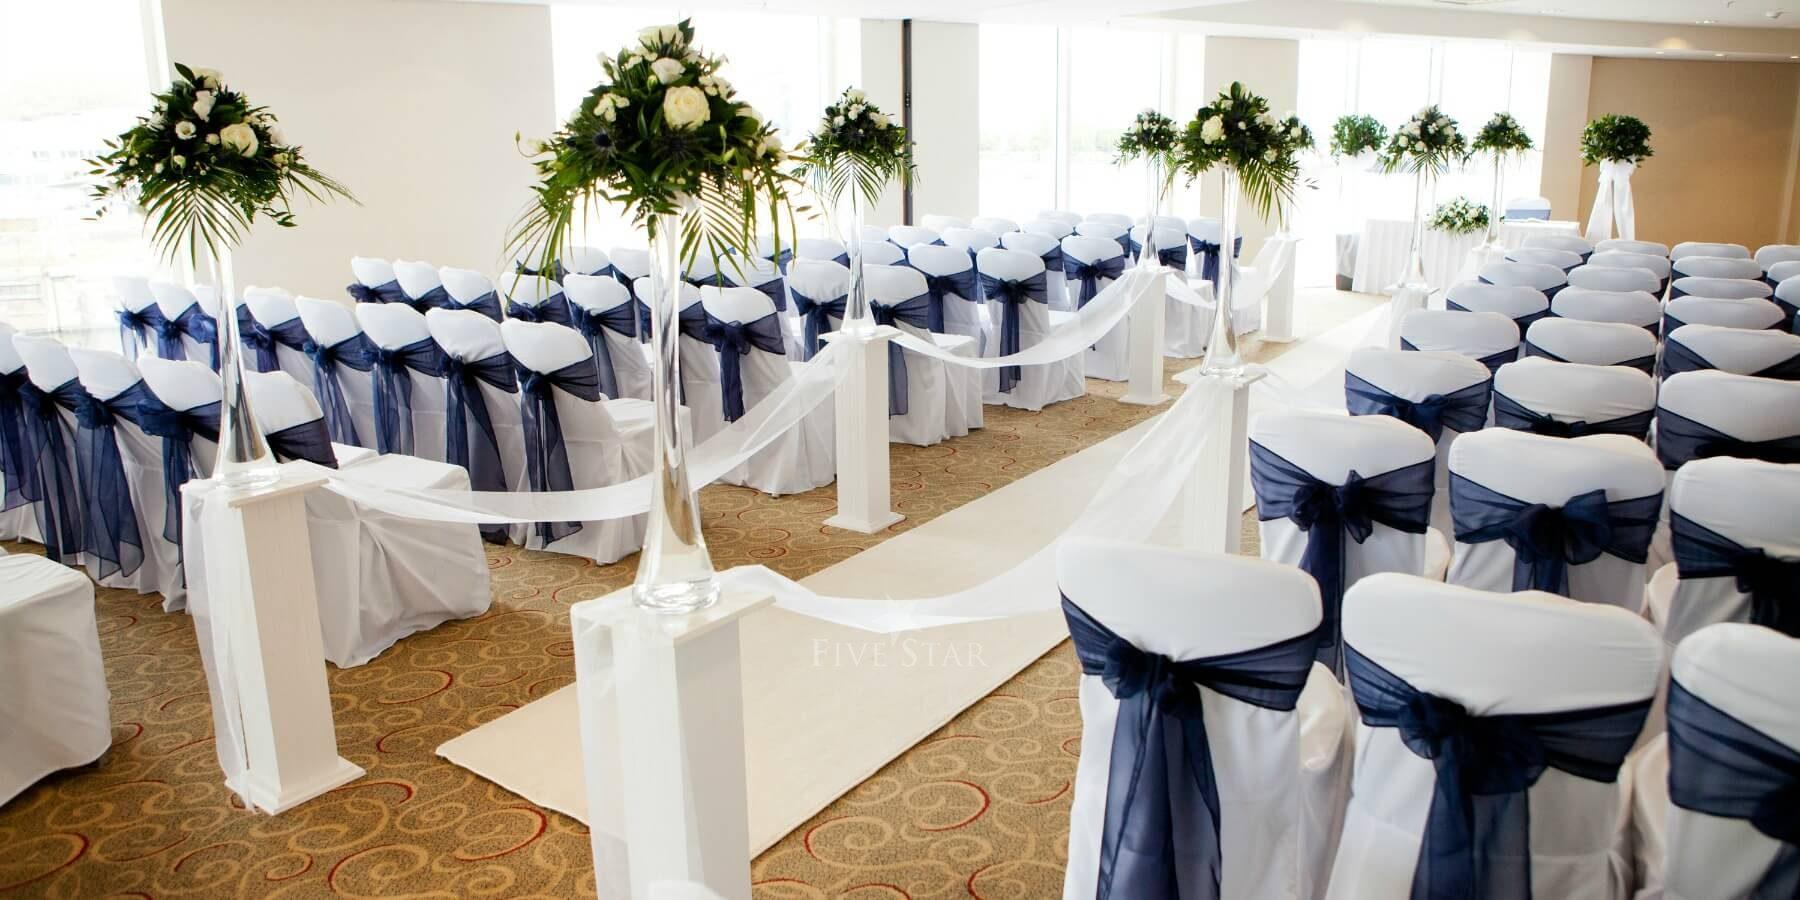 Exelent Pig Roast Wedding Reception Festooning - Wedding Idea 2018 ...